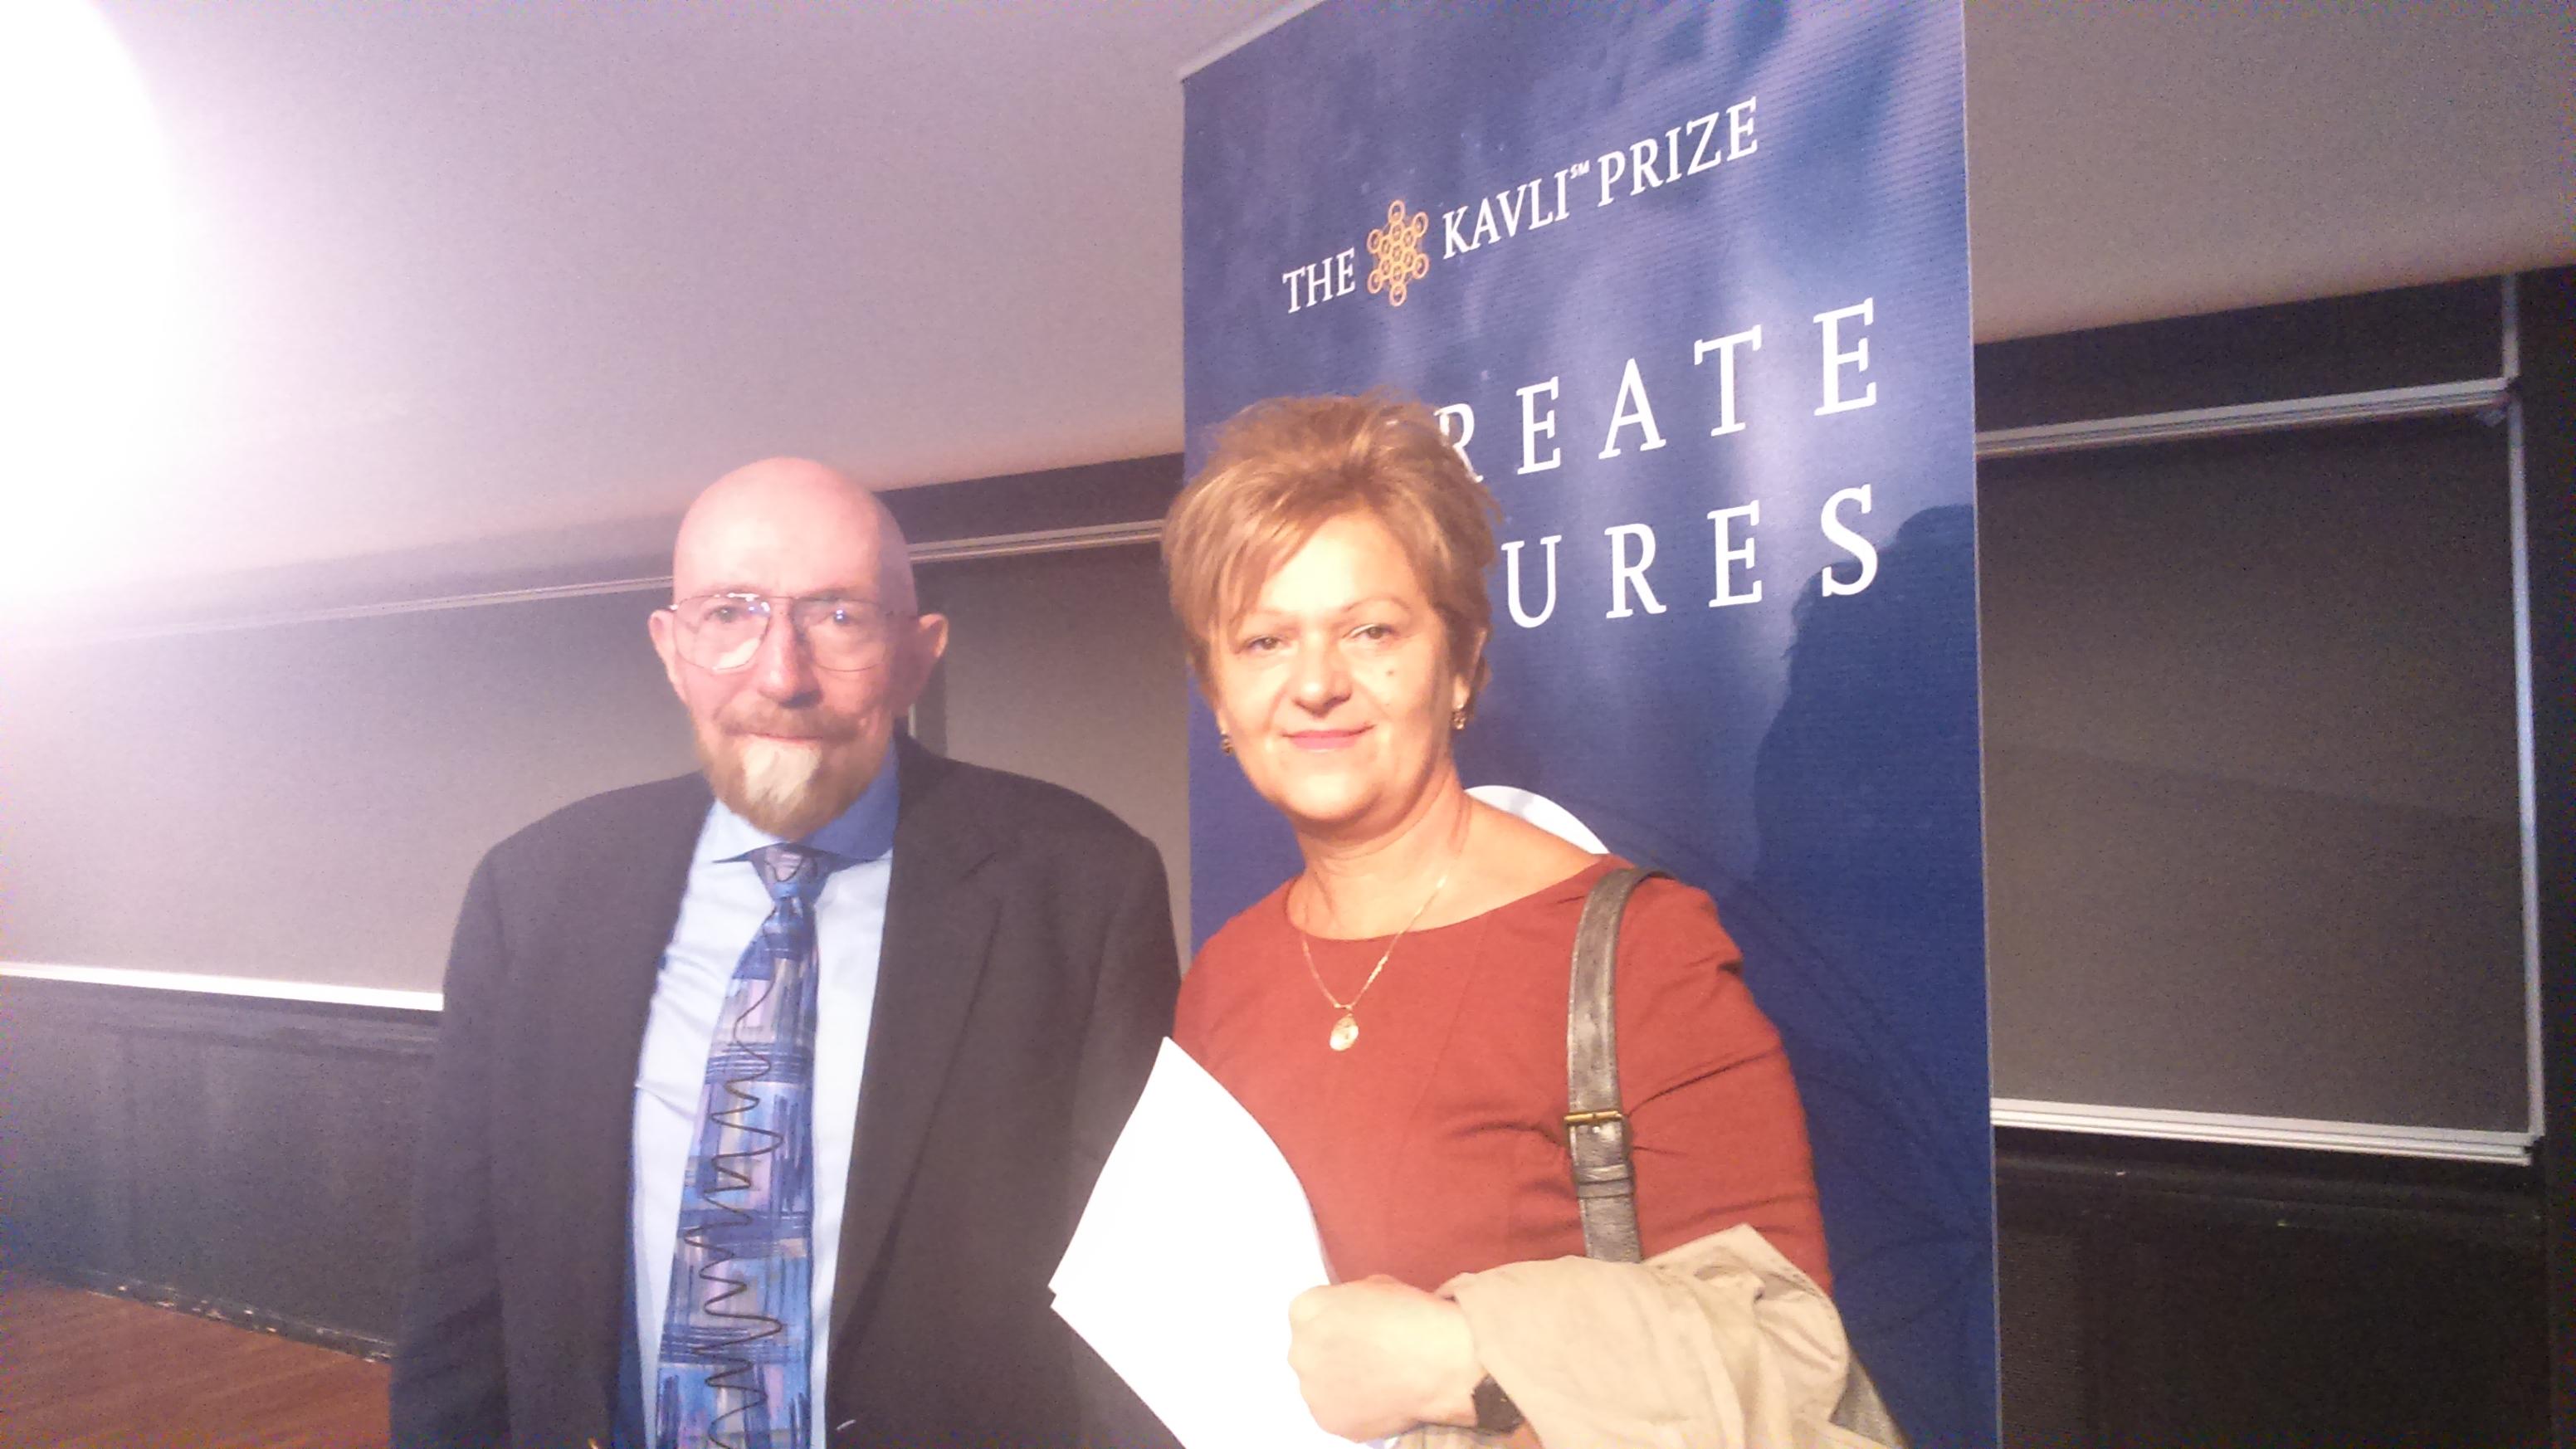 Dobitnik Nobelove nagrade Kip Thorne i novinarka Jutarnjeg lista Tanja Rudež